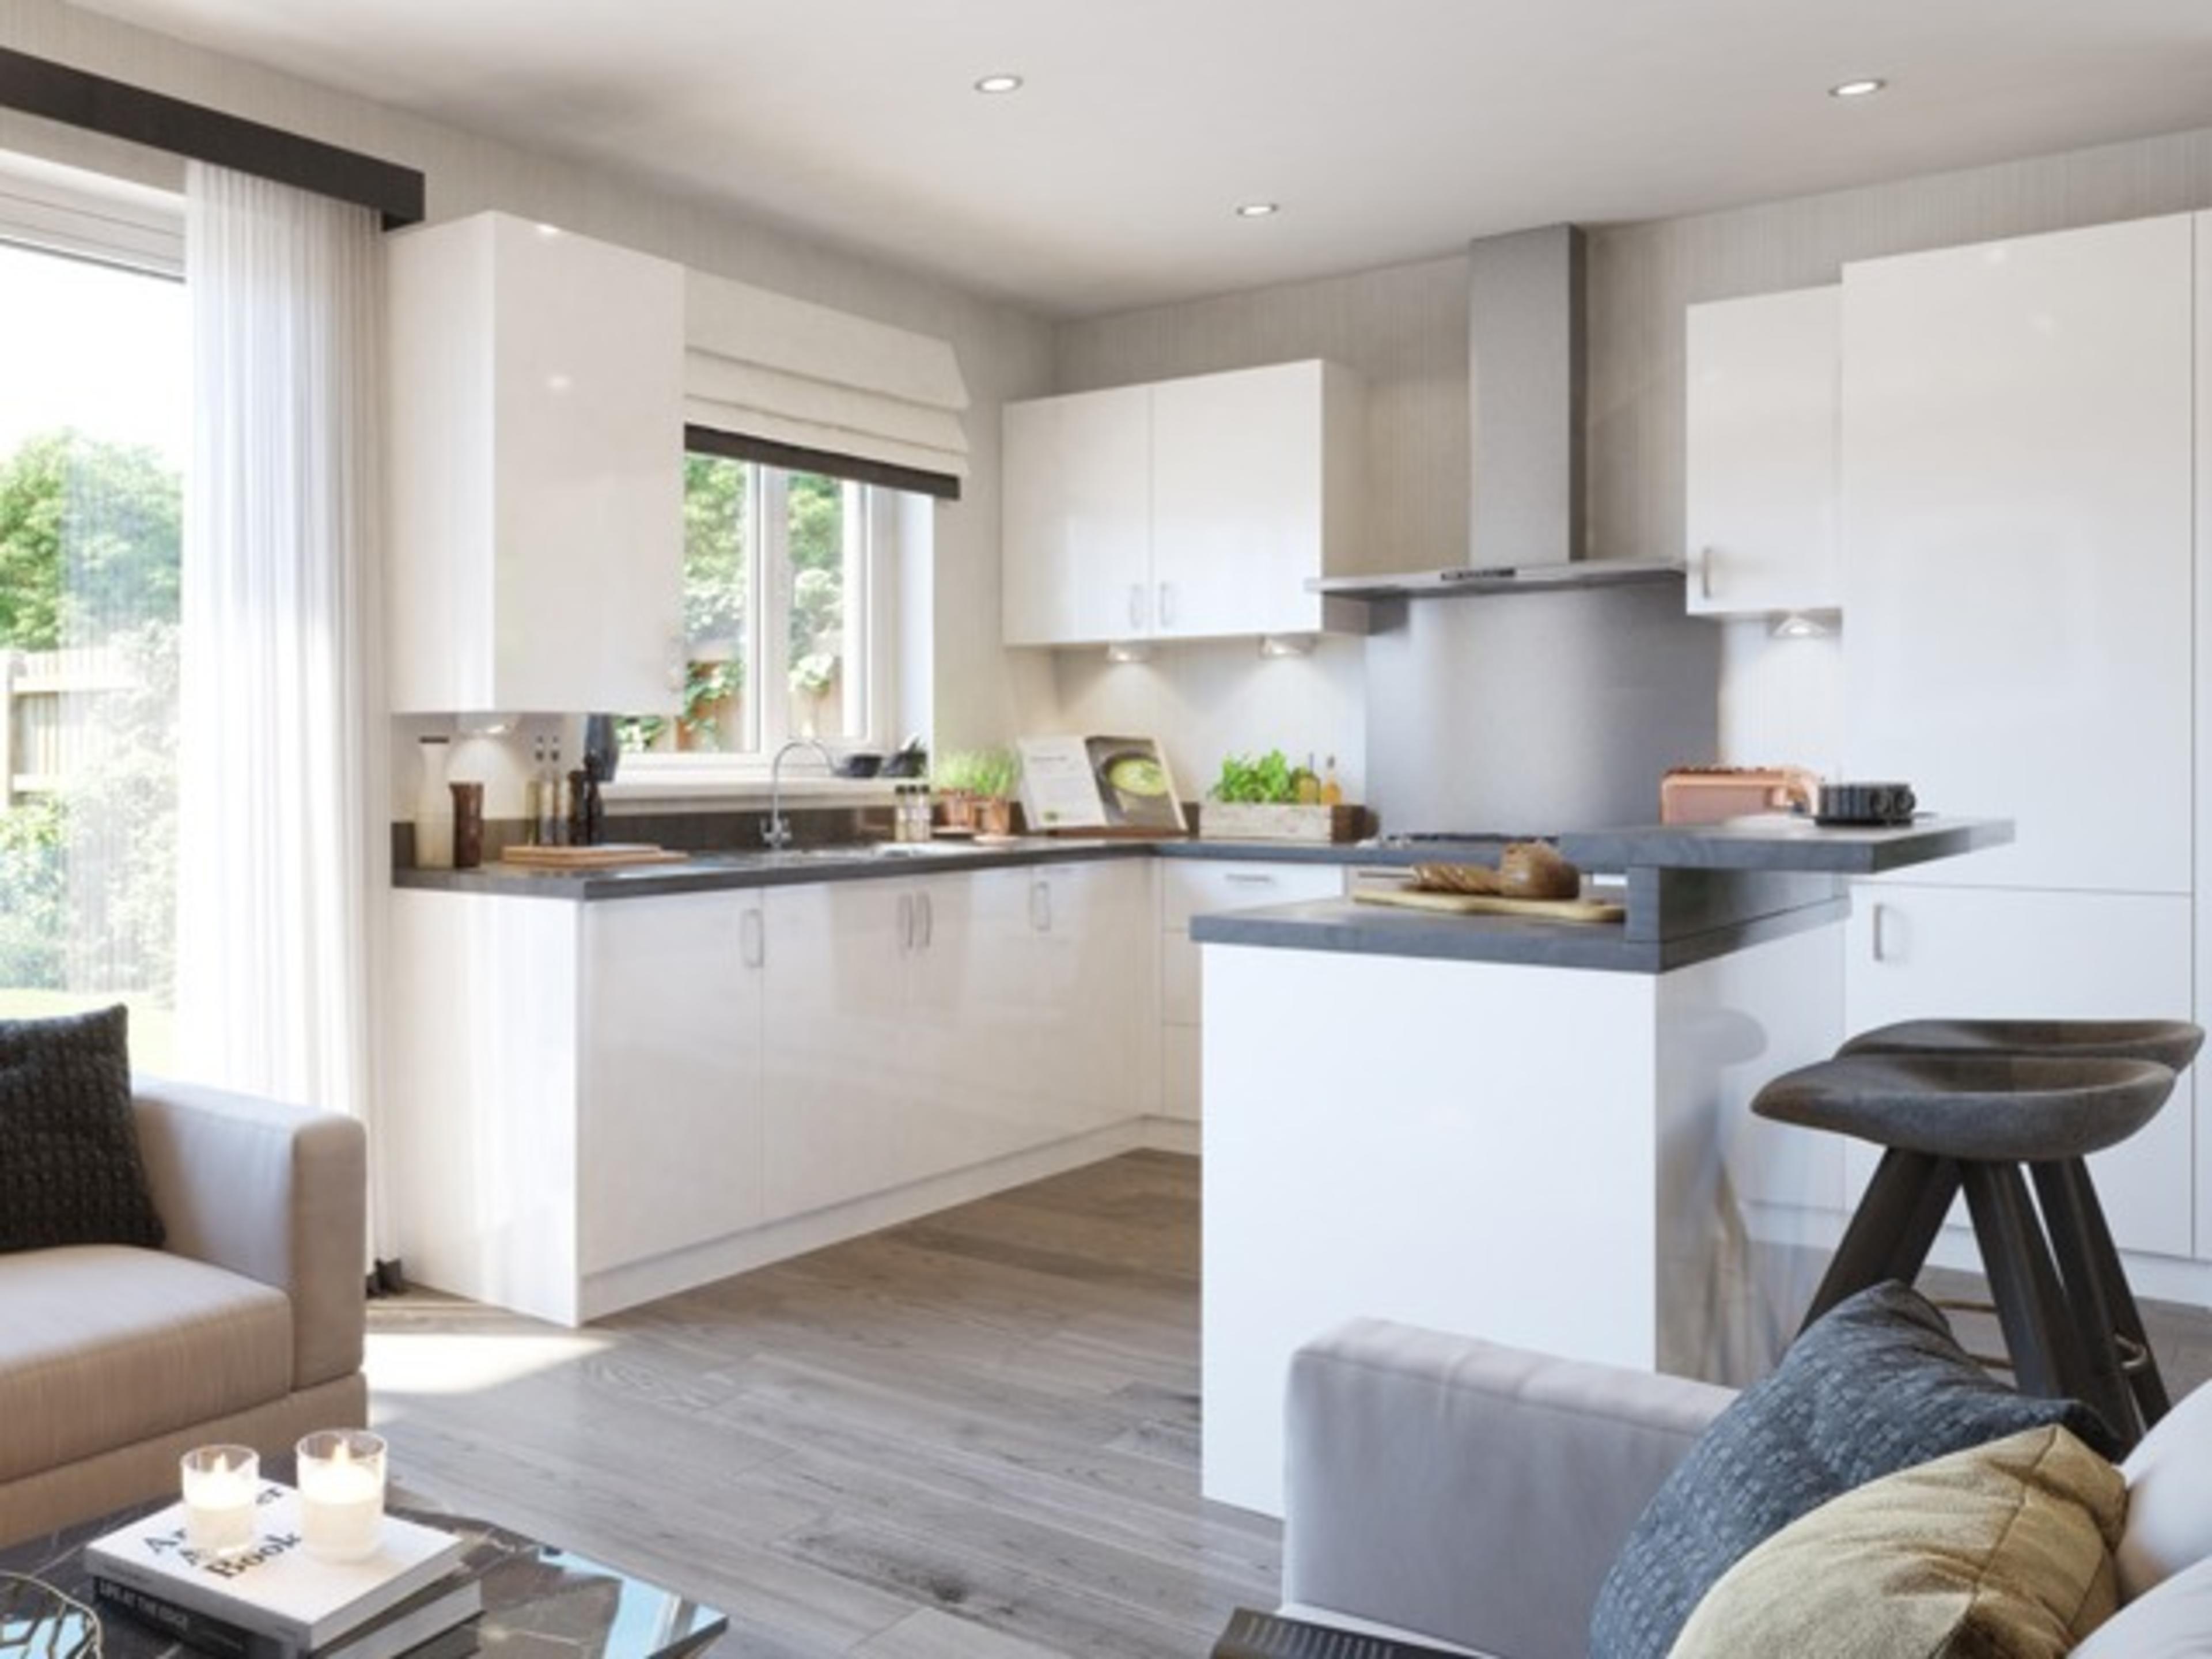 watling-grange-harrogate-revesby-type-m-kitchen-cgi